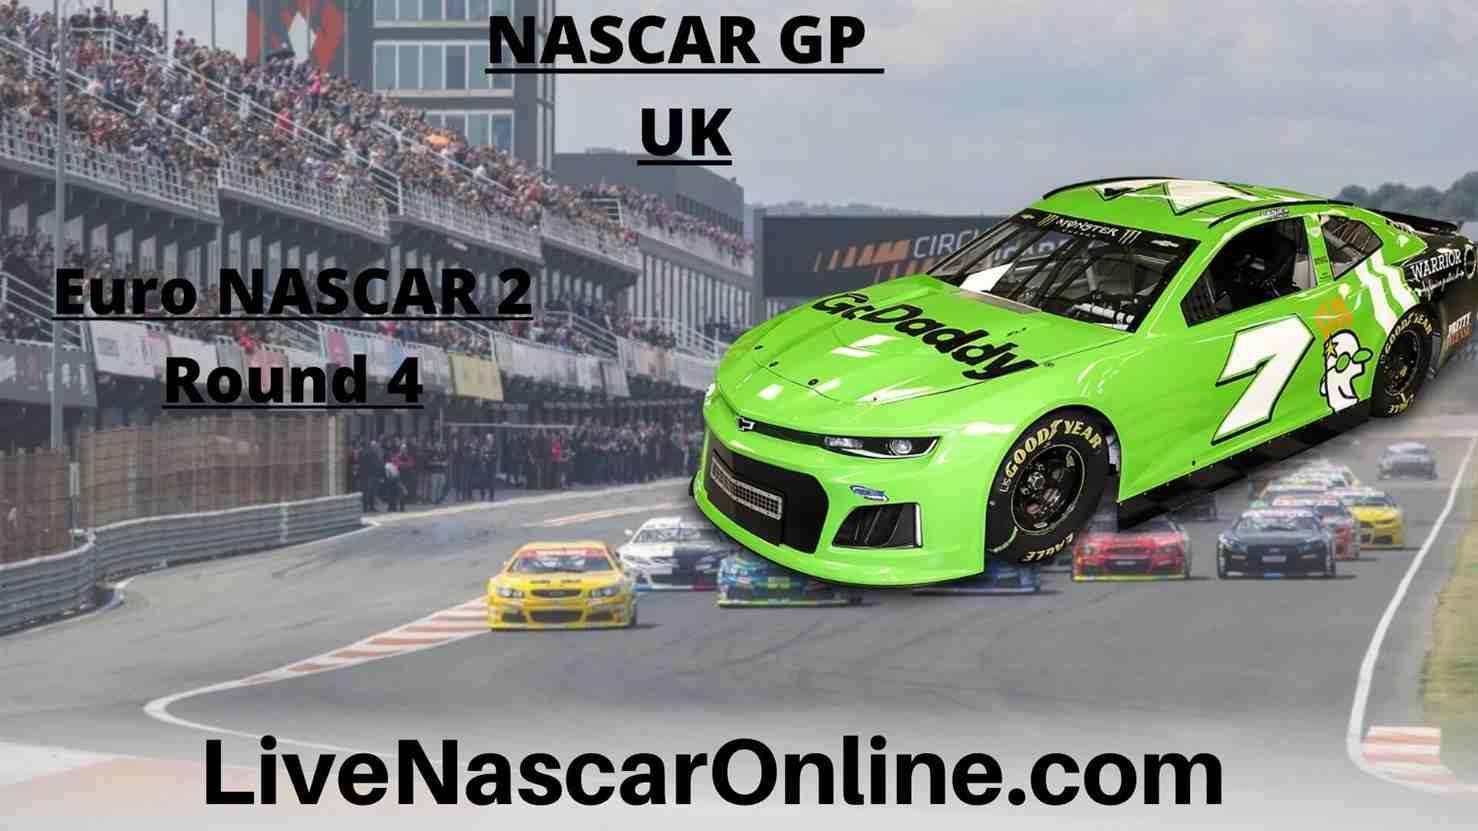 NASCAR GP UK Online Stream | Euro NASCAR 2 Round 4